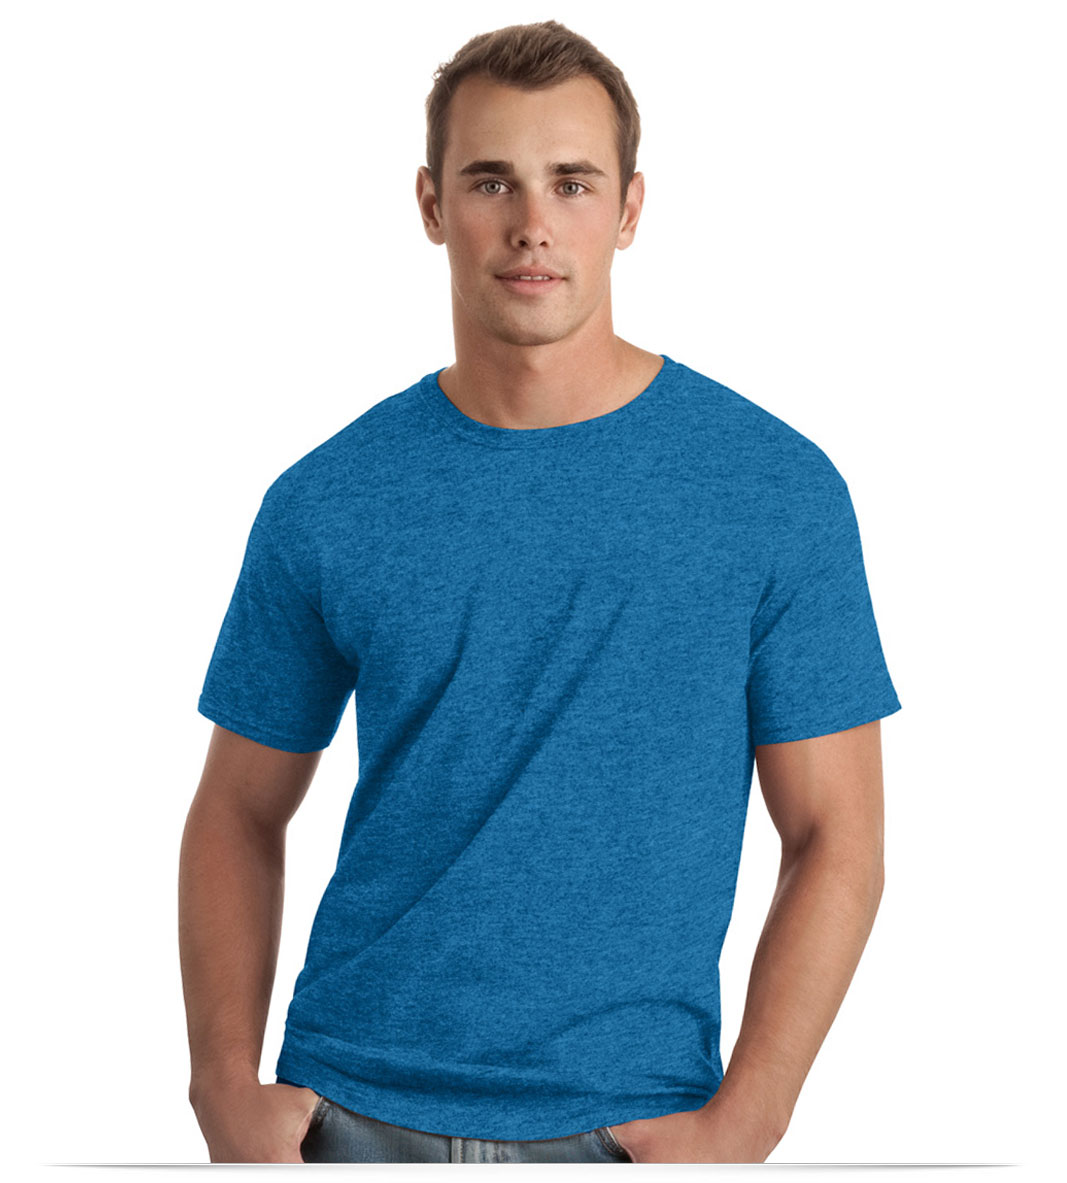 Customize Gildan Softstyle T-Shirt